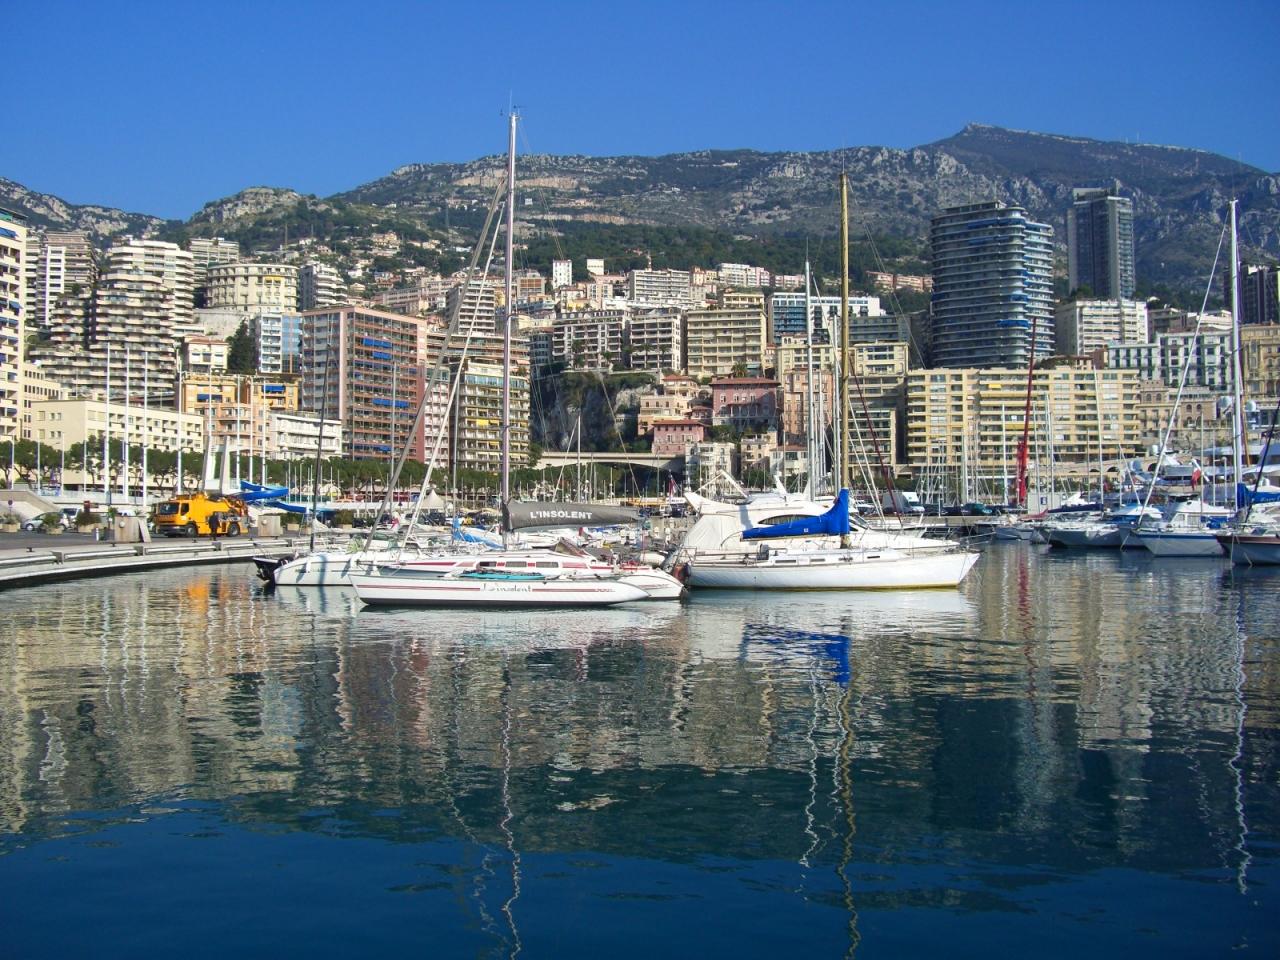 ����Ŵƻ��ι�ʥ�ʥ� Monaco��